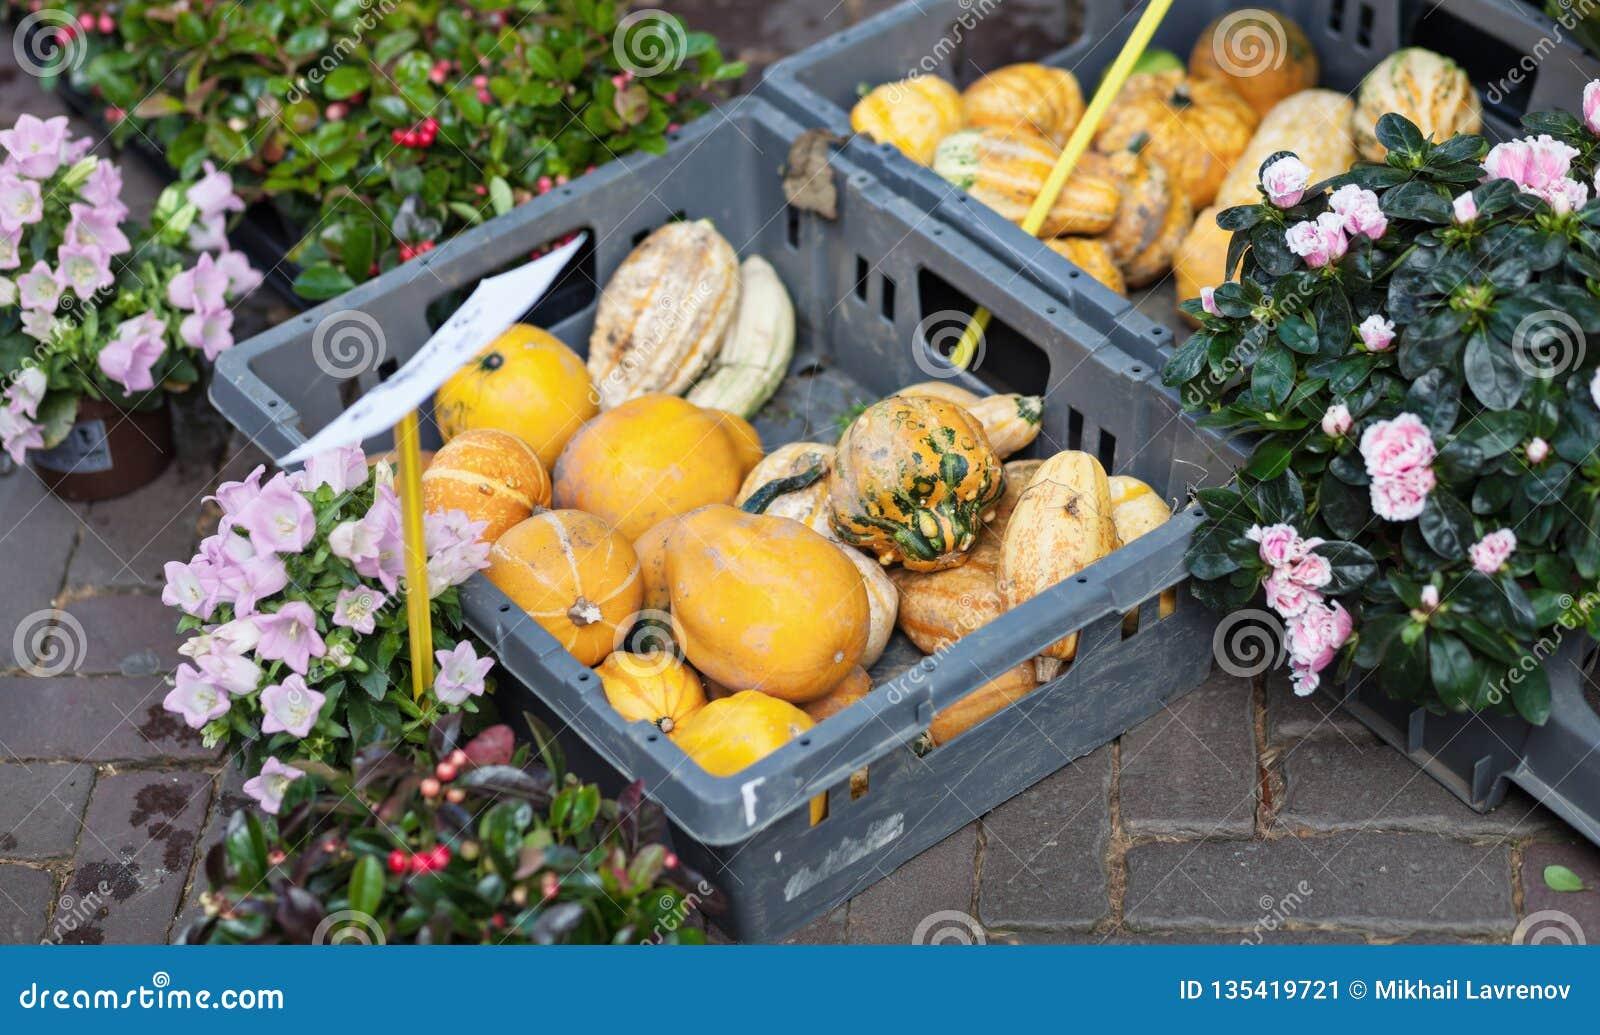 Pumpkins and flowers at open street market